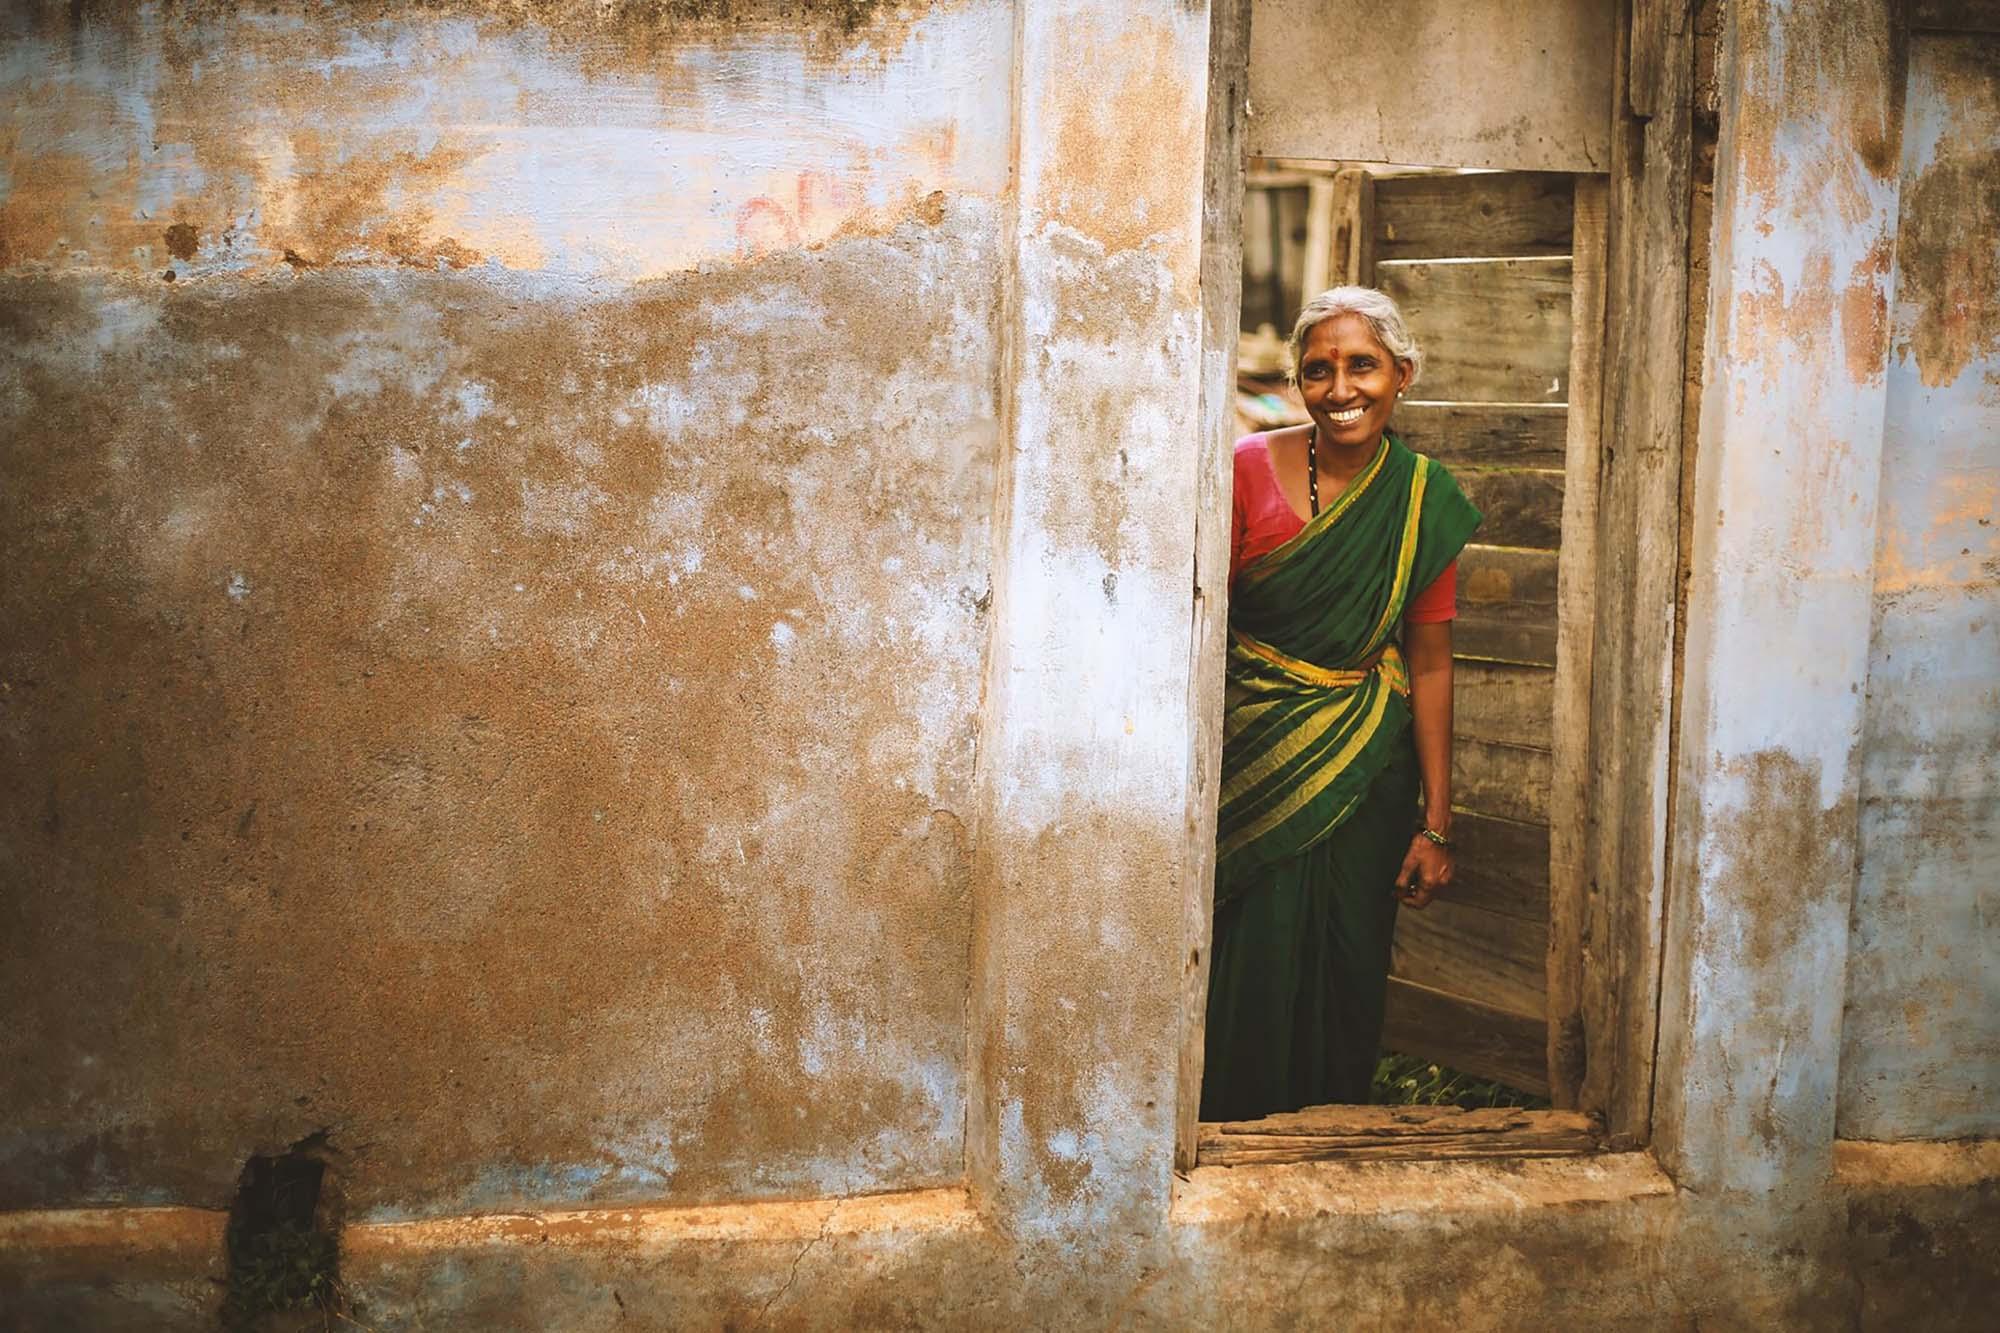 Woman smiling in a doorway